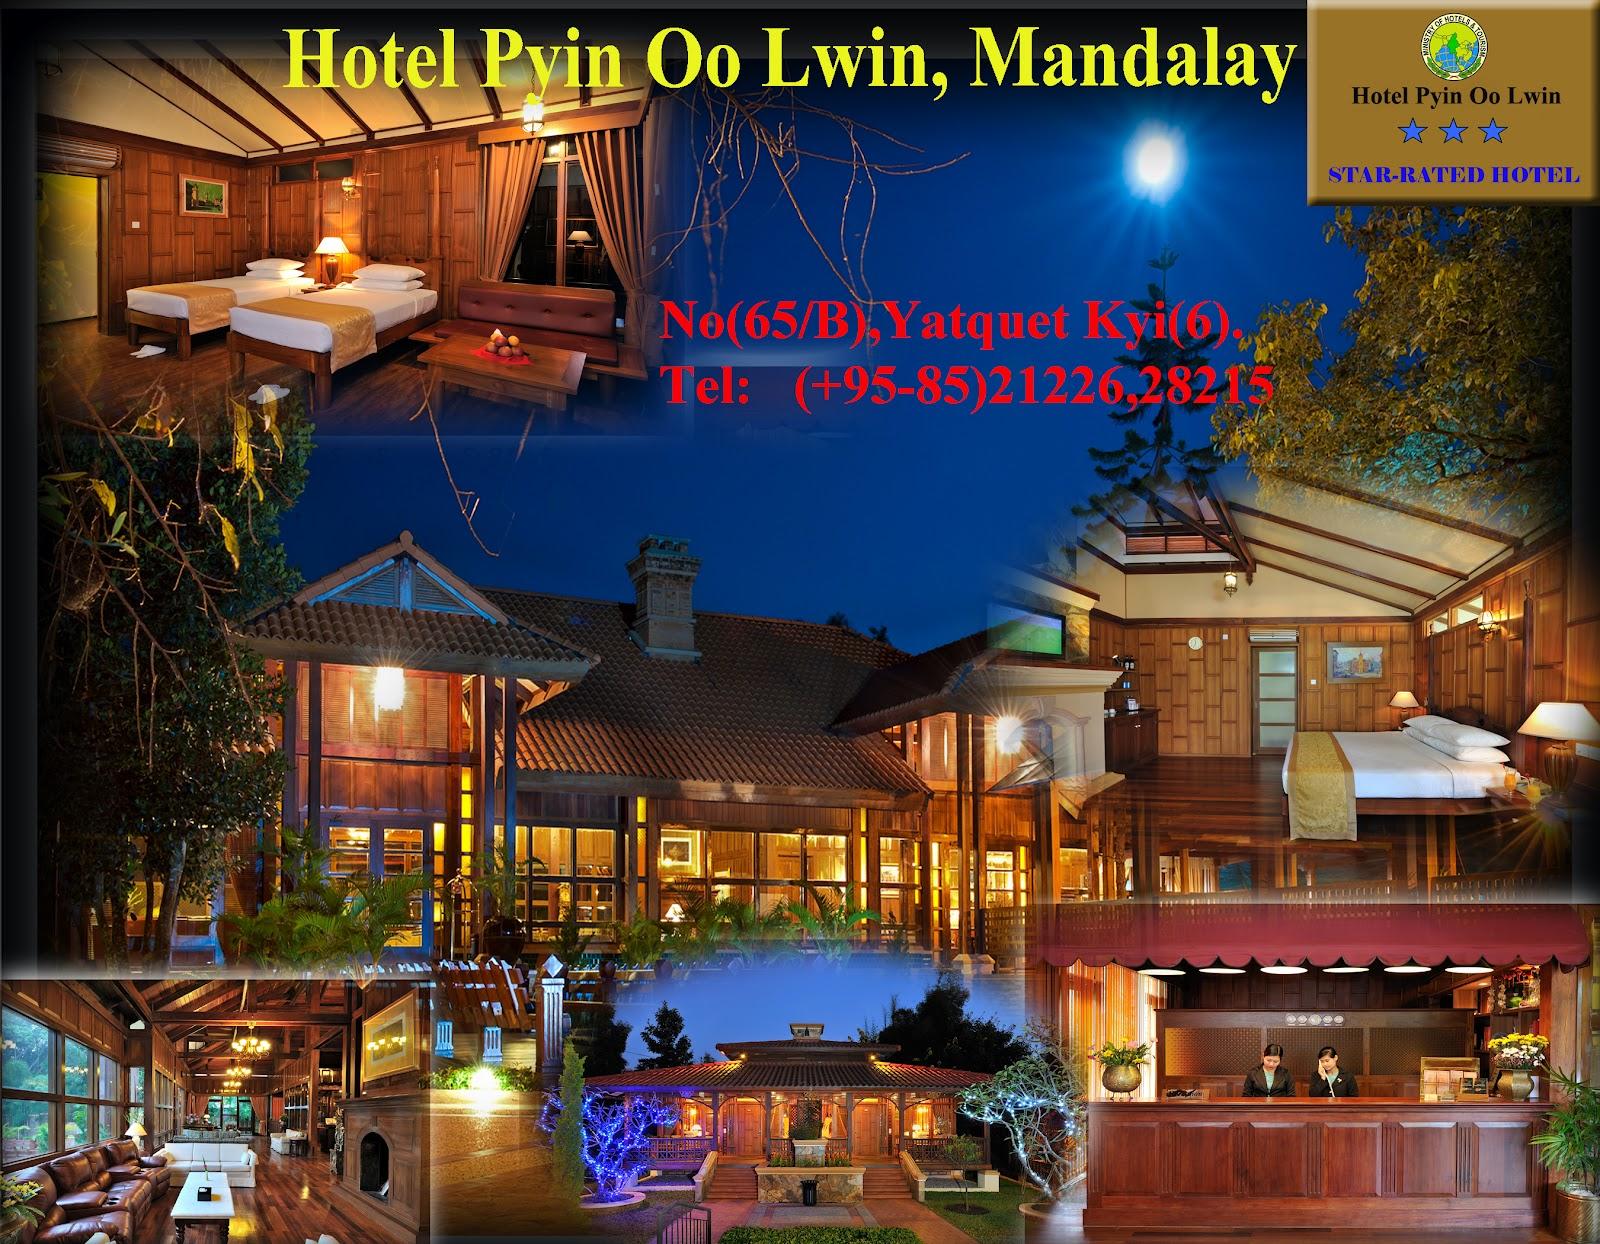 Hotel pyin oo lwin mandalay ministry of hotels for Hotel manin milano